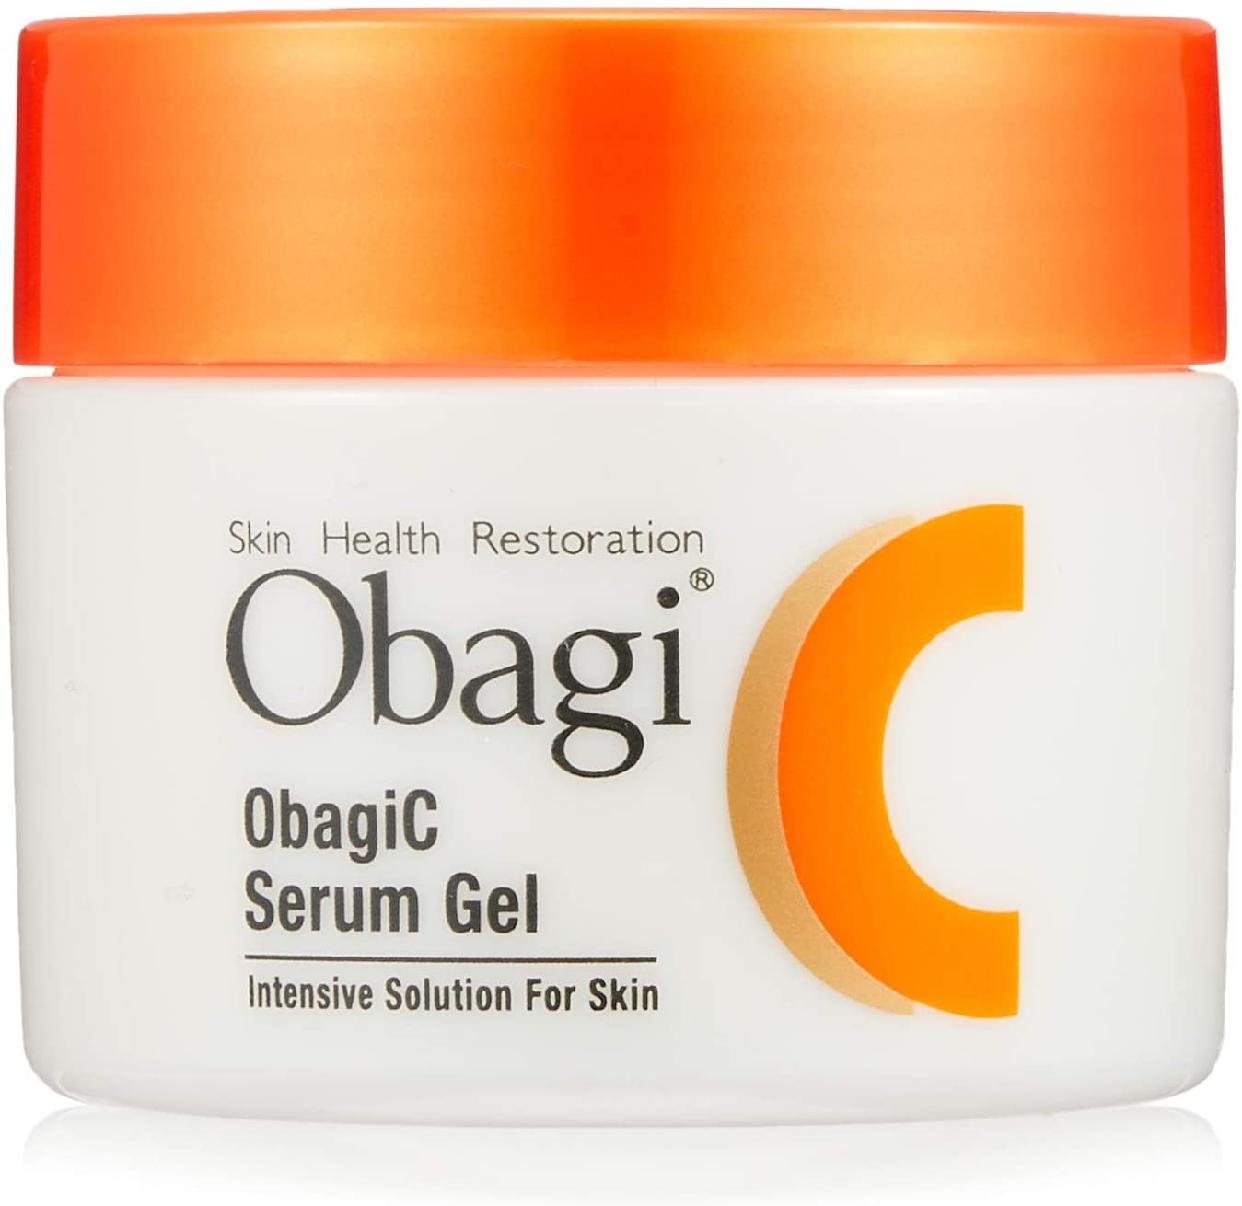 Obagi(オバジ) オバジC セラムゲル